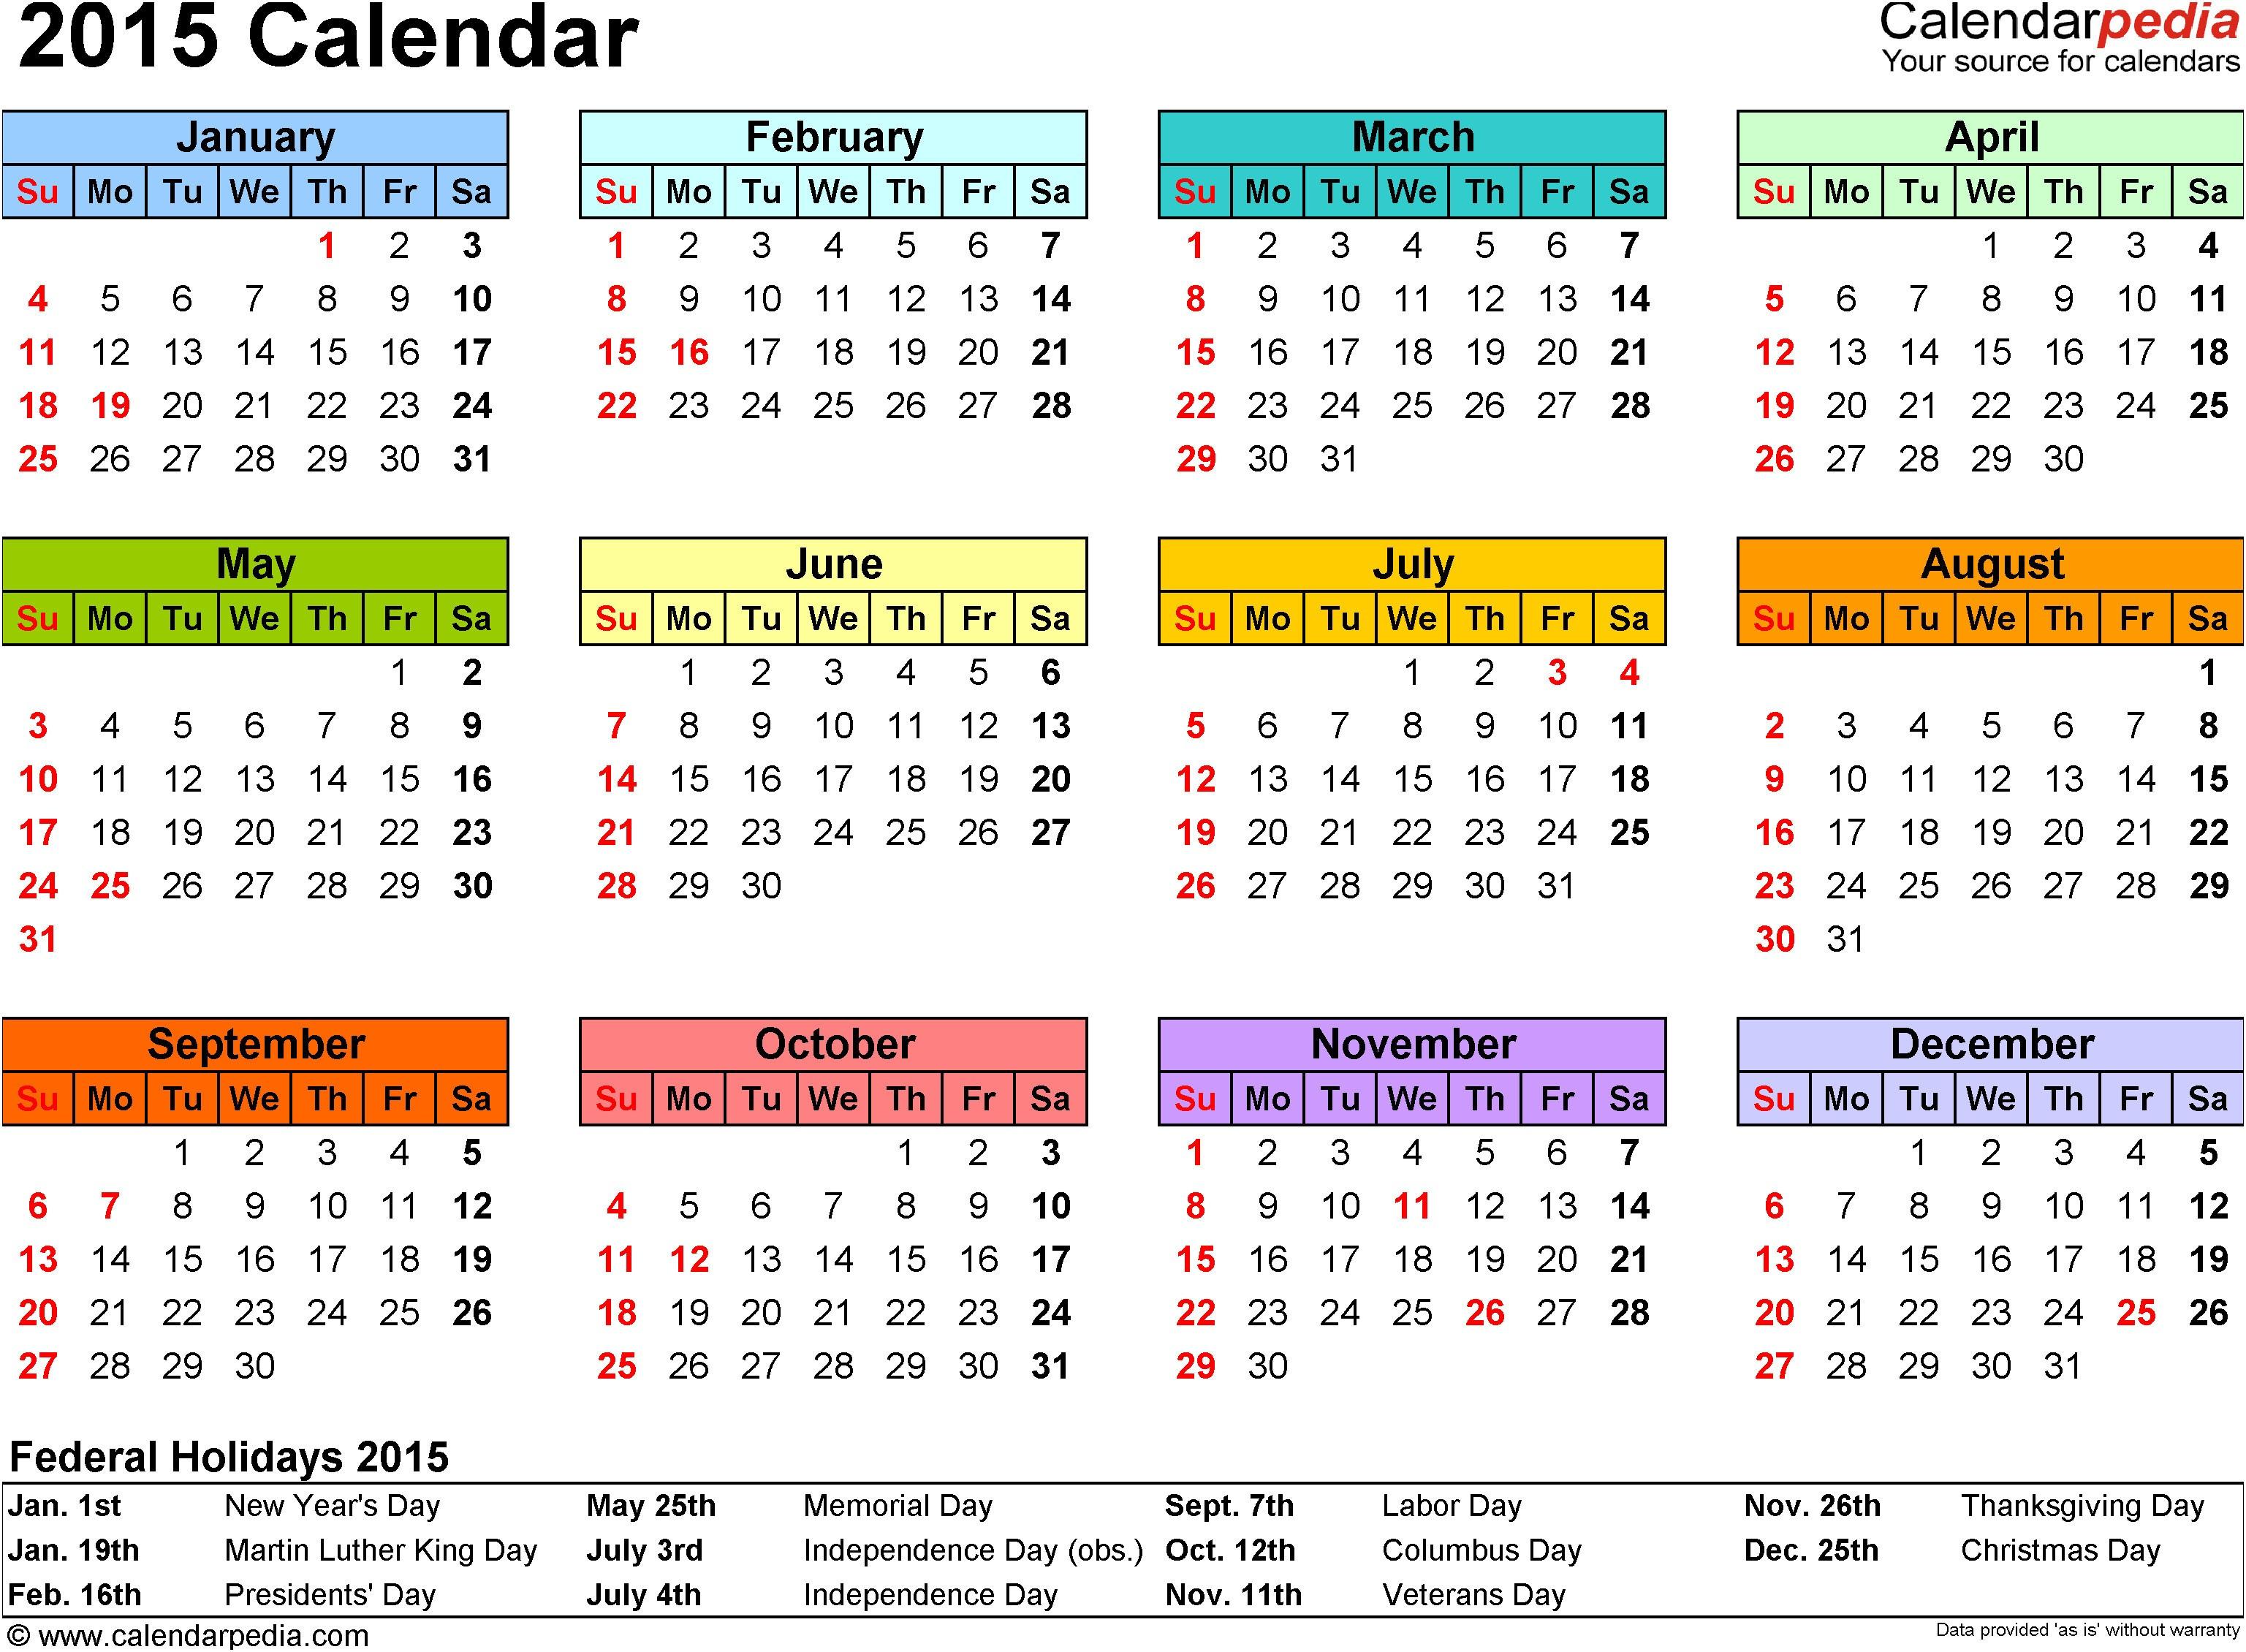 March Calendar Canada Más Populares 2015 Calendar Template with Canadian Holidays 57 Best Printable Of March Calendar Canada Más Recientes Flowers March 2019 Desktop Calendar March March2019